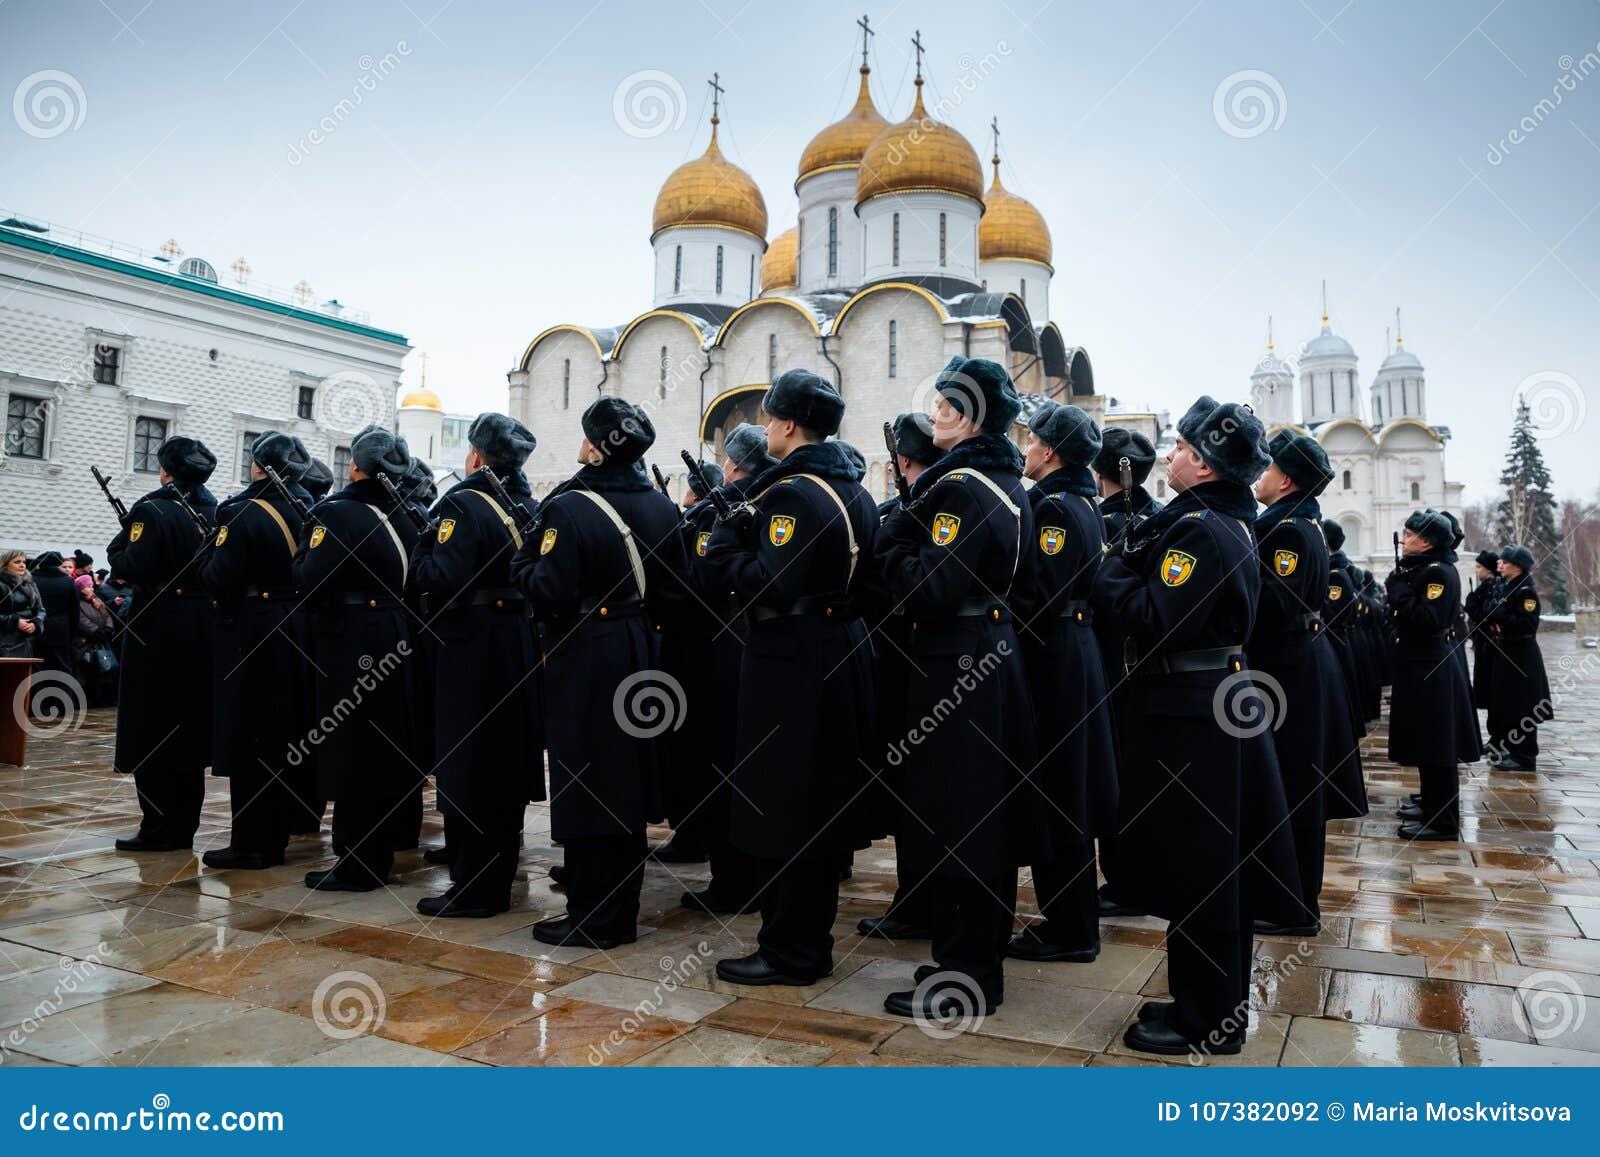 Formacja Prezydencki pułk usługa Moskwa Kremlin's Commandant